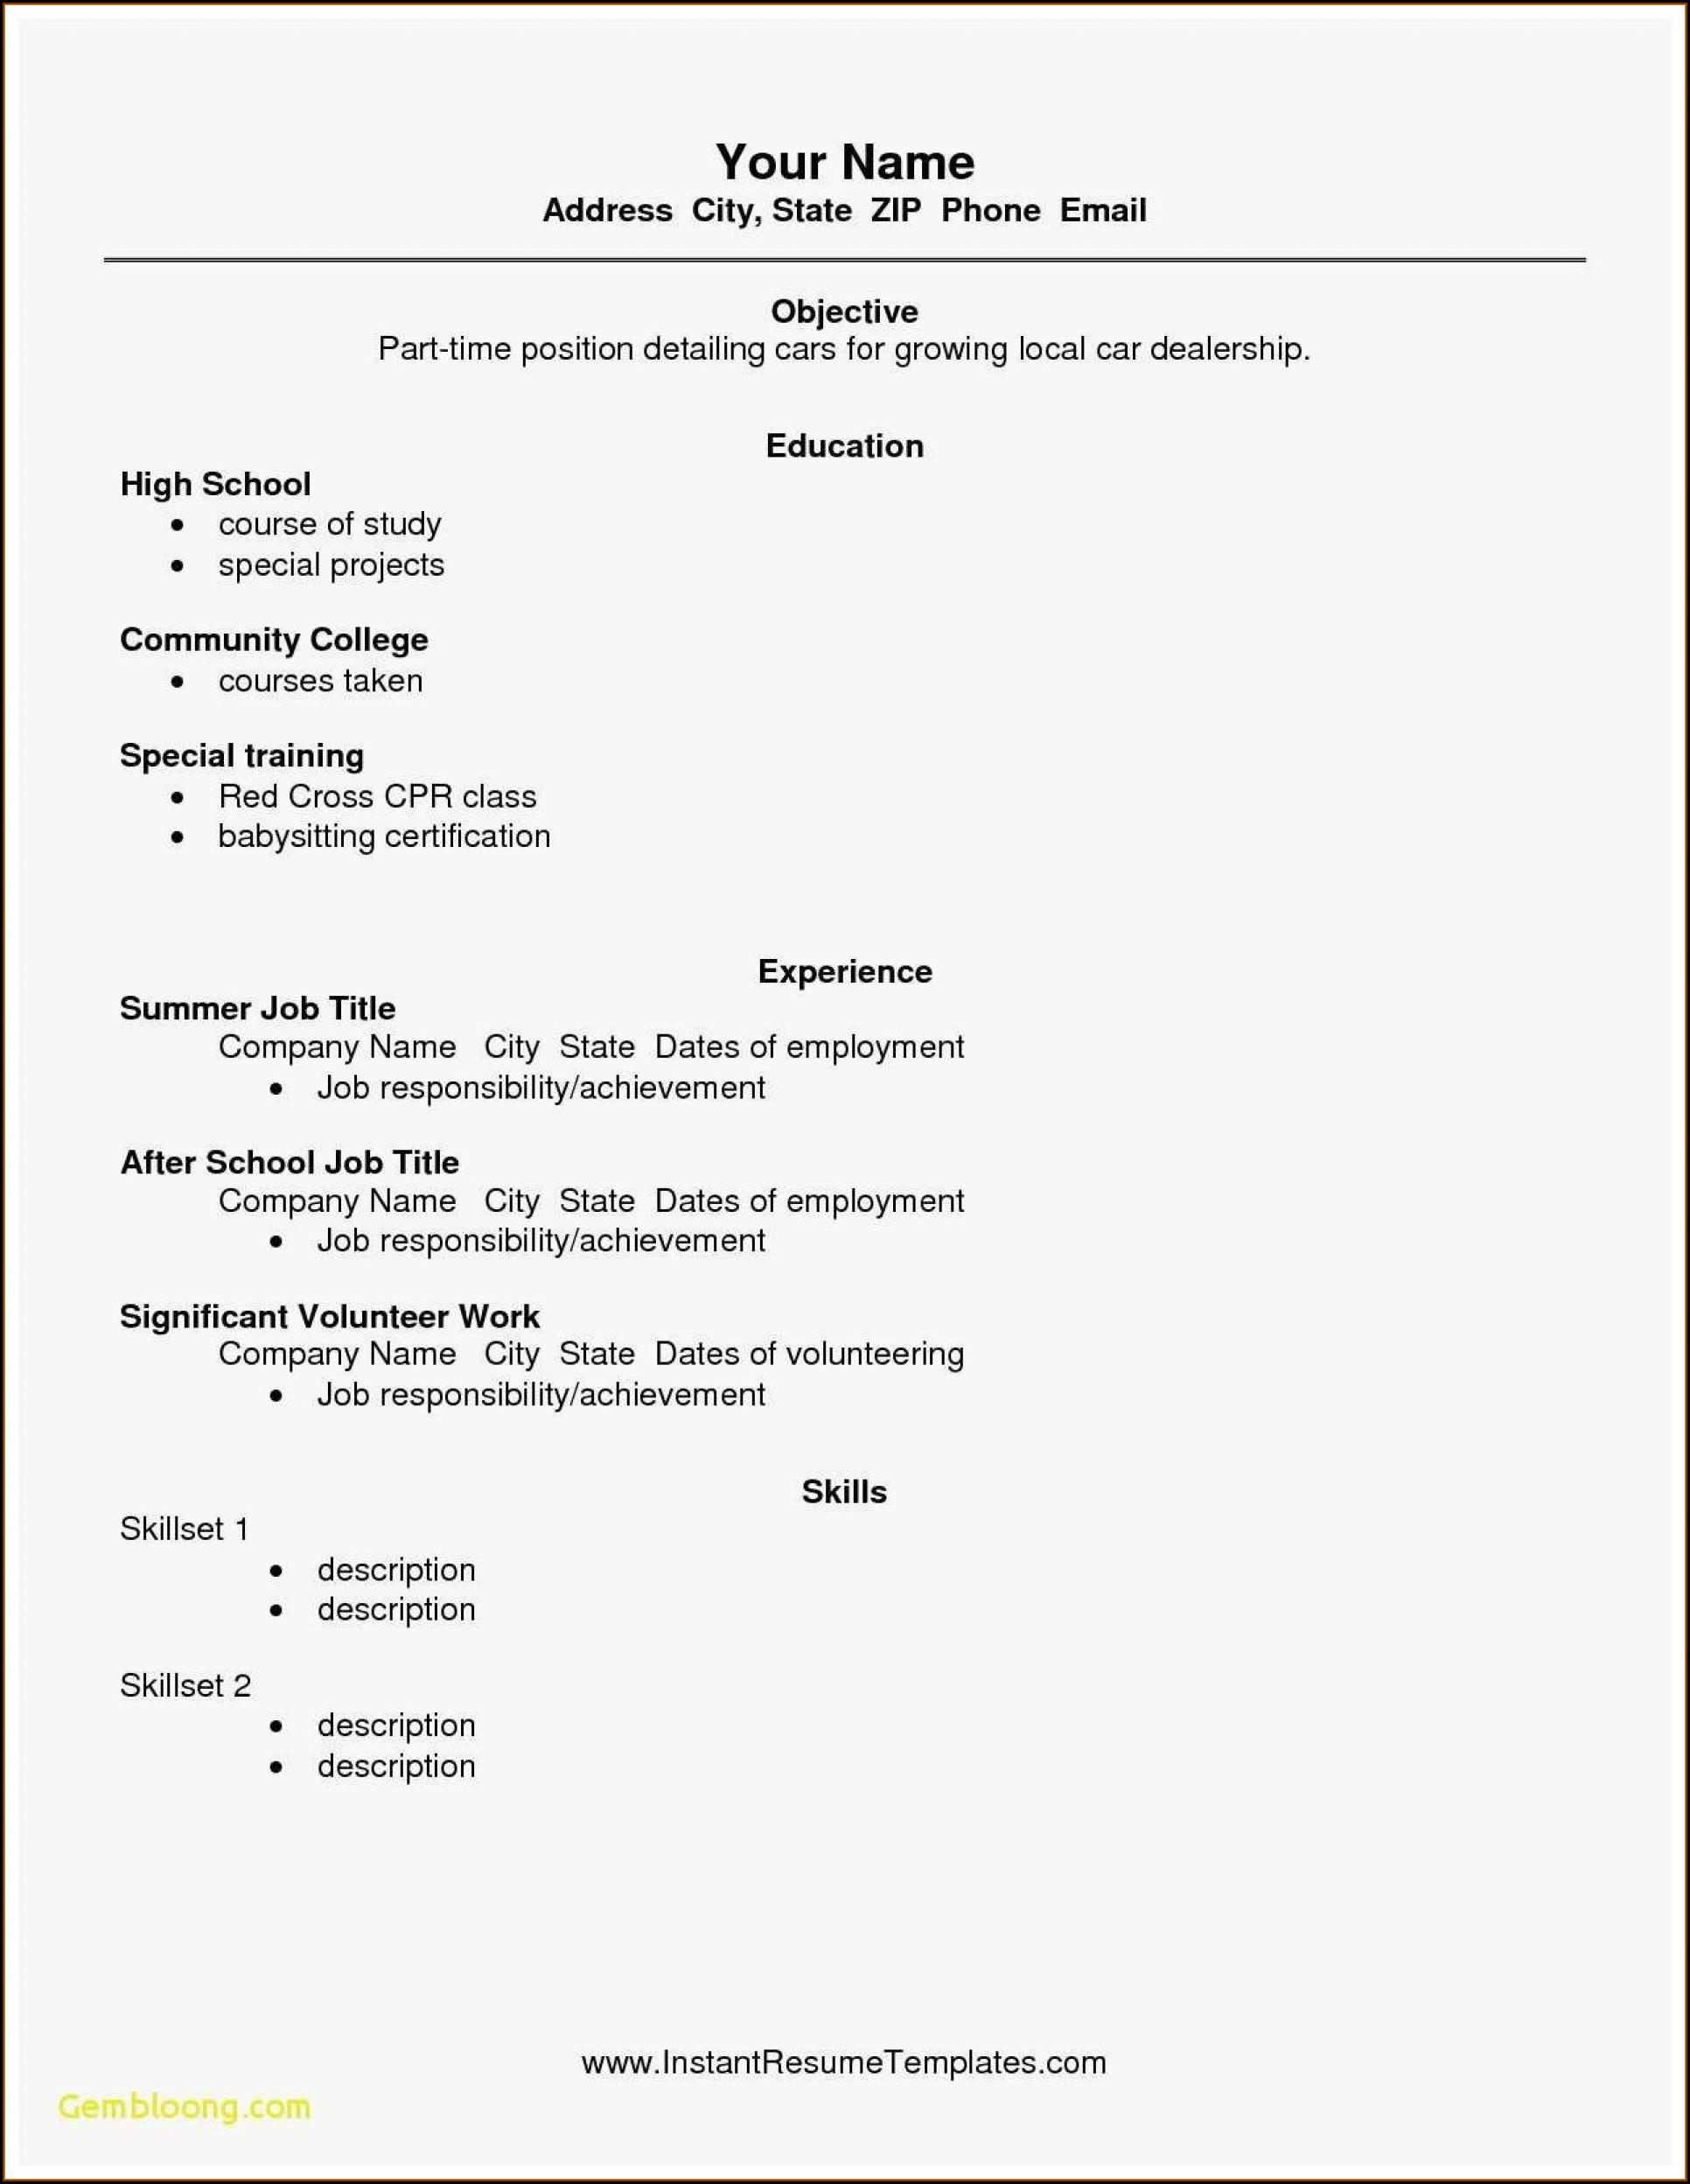 Free High School Graduate Resume Templates